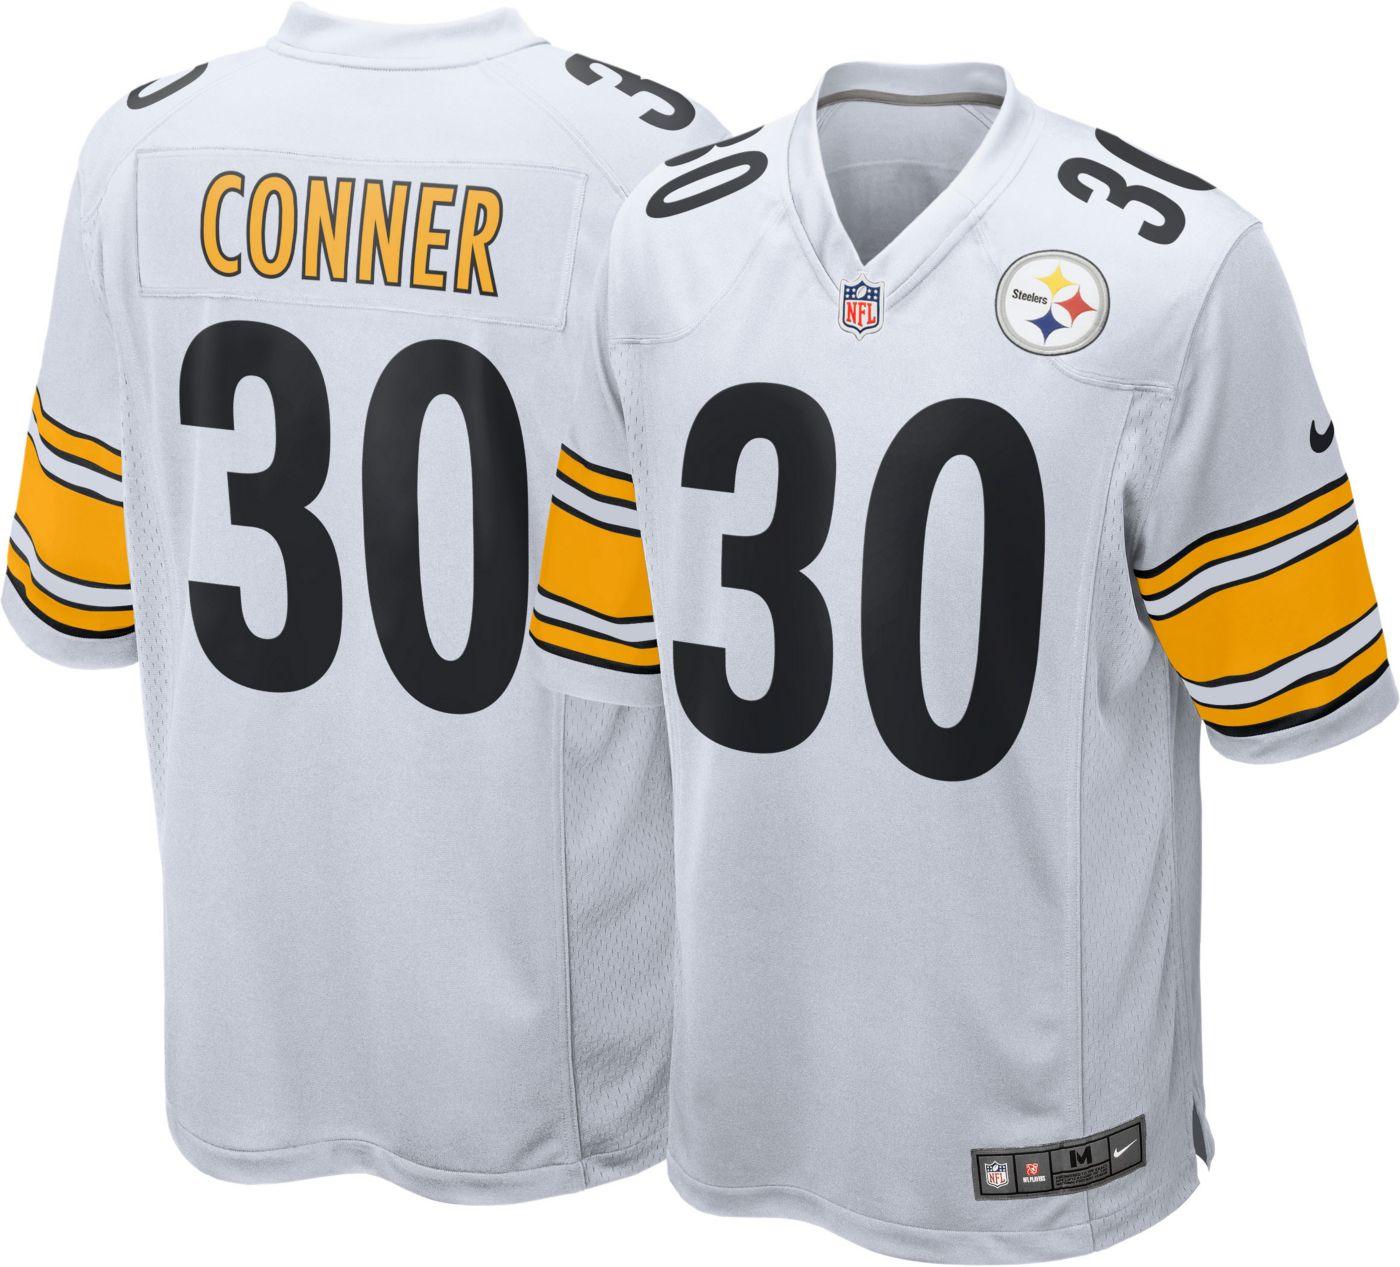 Nike Men's Away Game Jersey Pittsburgh Steelers James Conner #30